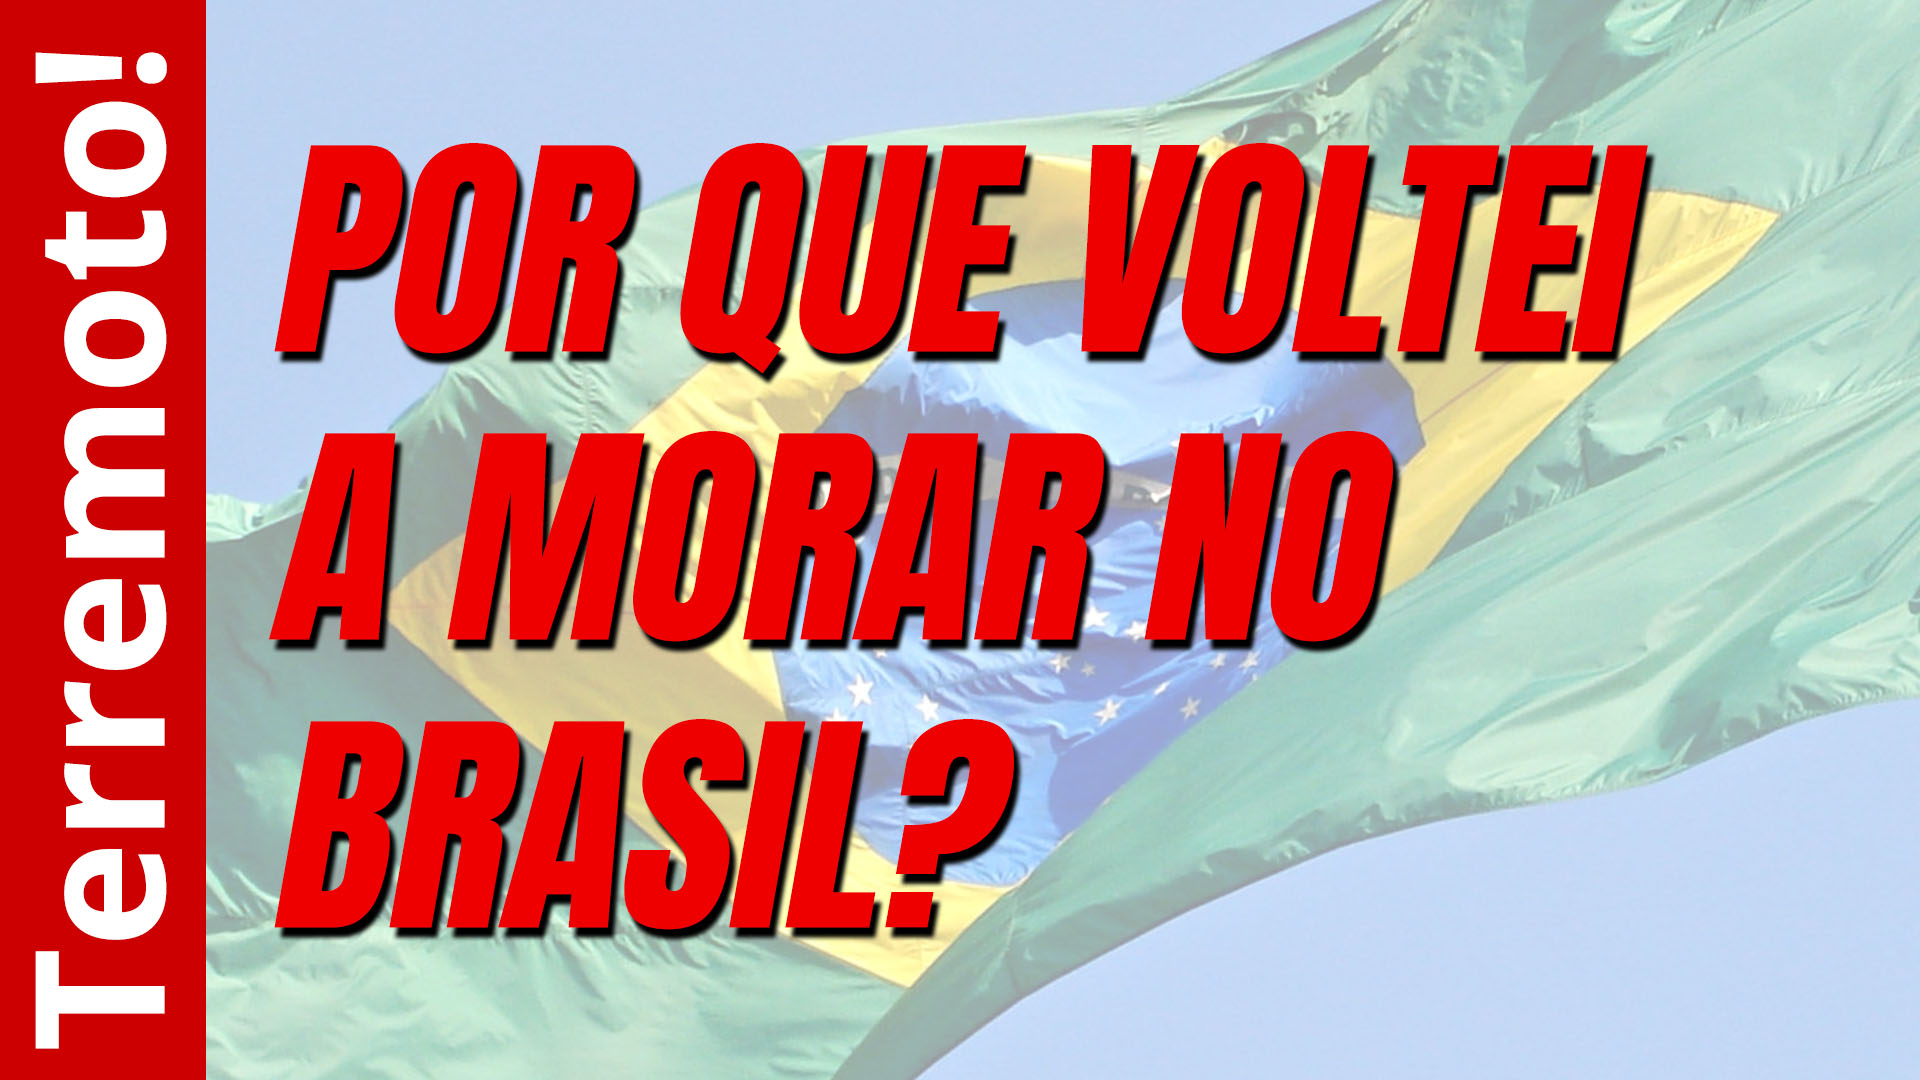 Por que voltei a morar no Brasil?